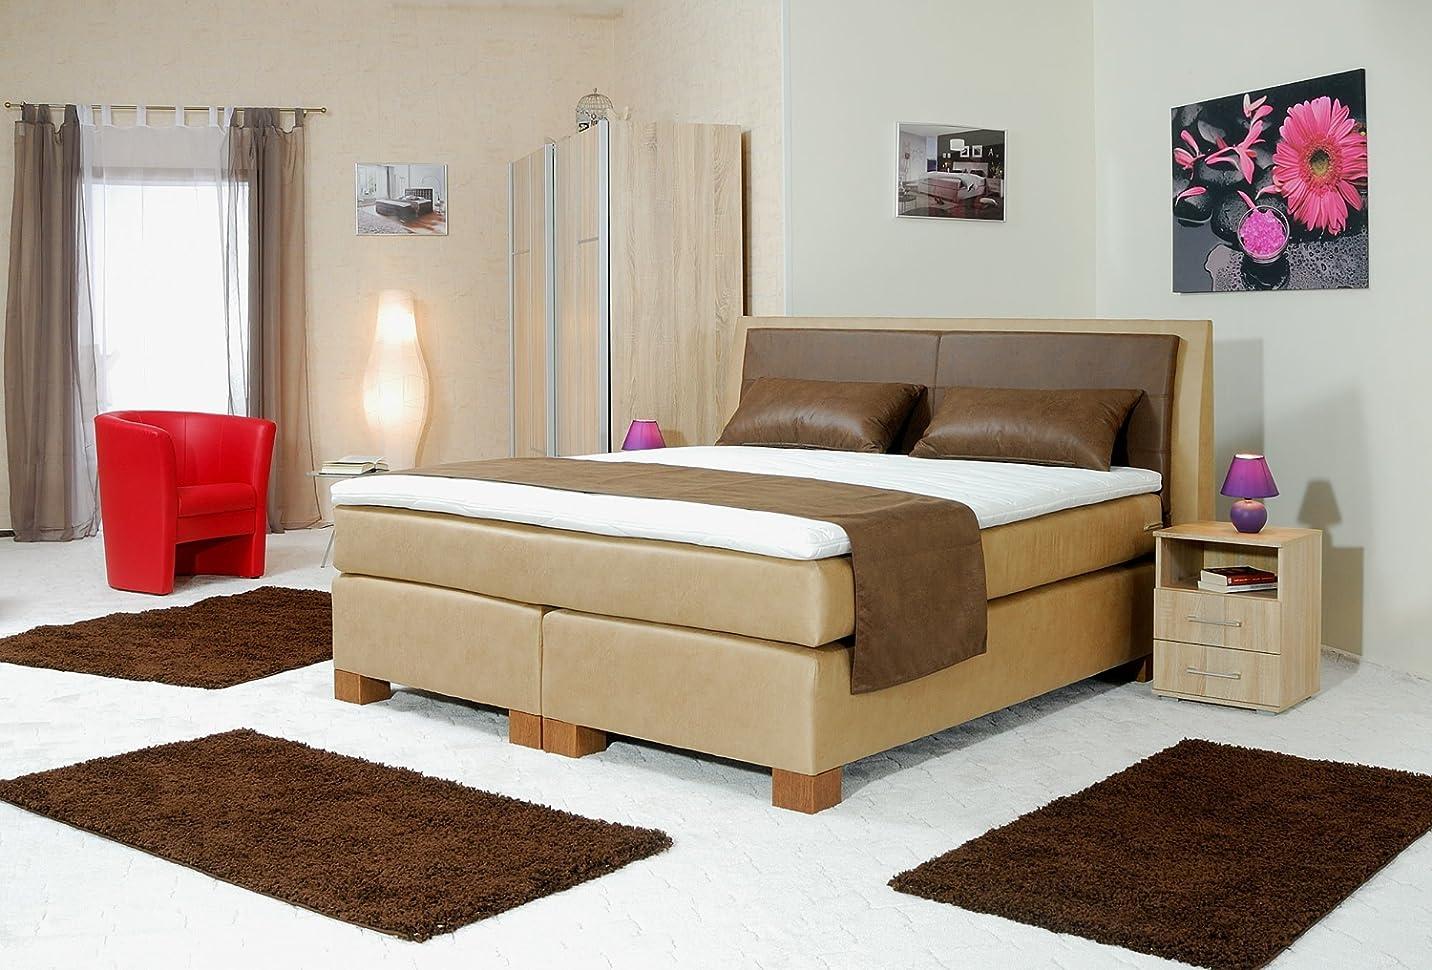 spenger bettenstudio boxspringbett ronja 120x200 cm. Black Bedroom Furniture Sets. Home Design Ideas